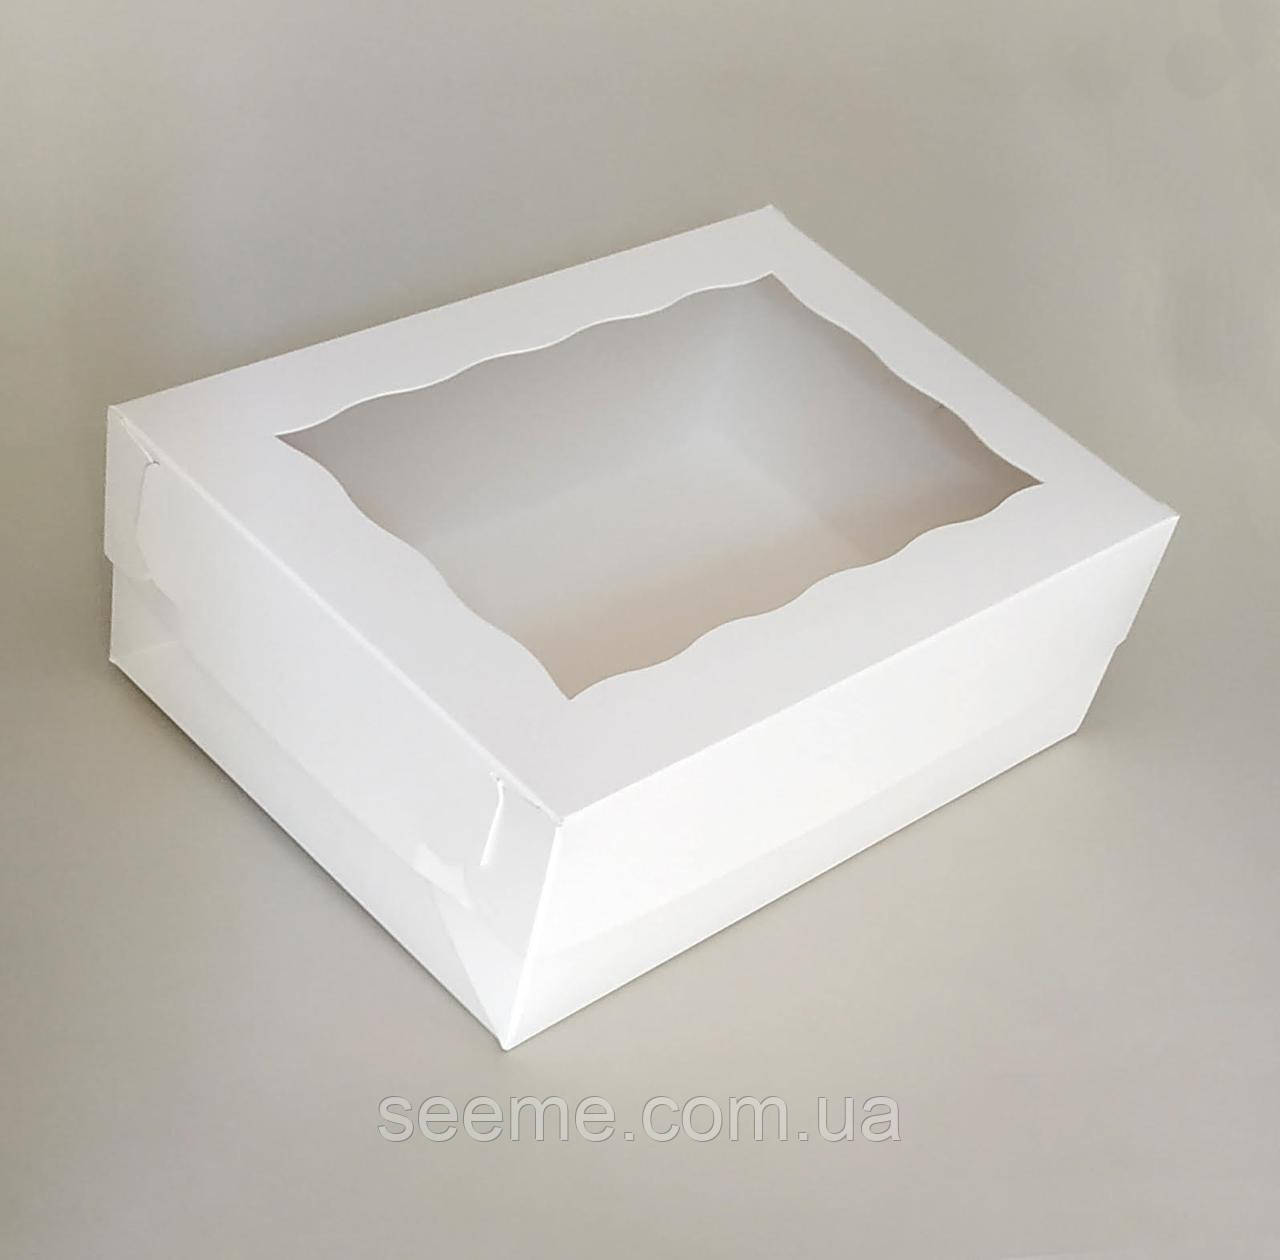 Коробка подарочная с окошком 255x180x90 мм